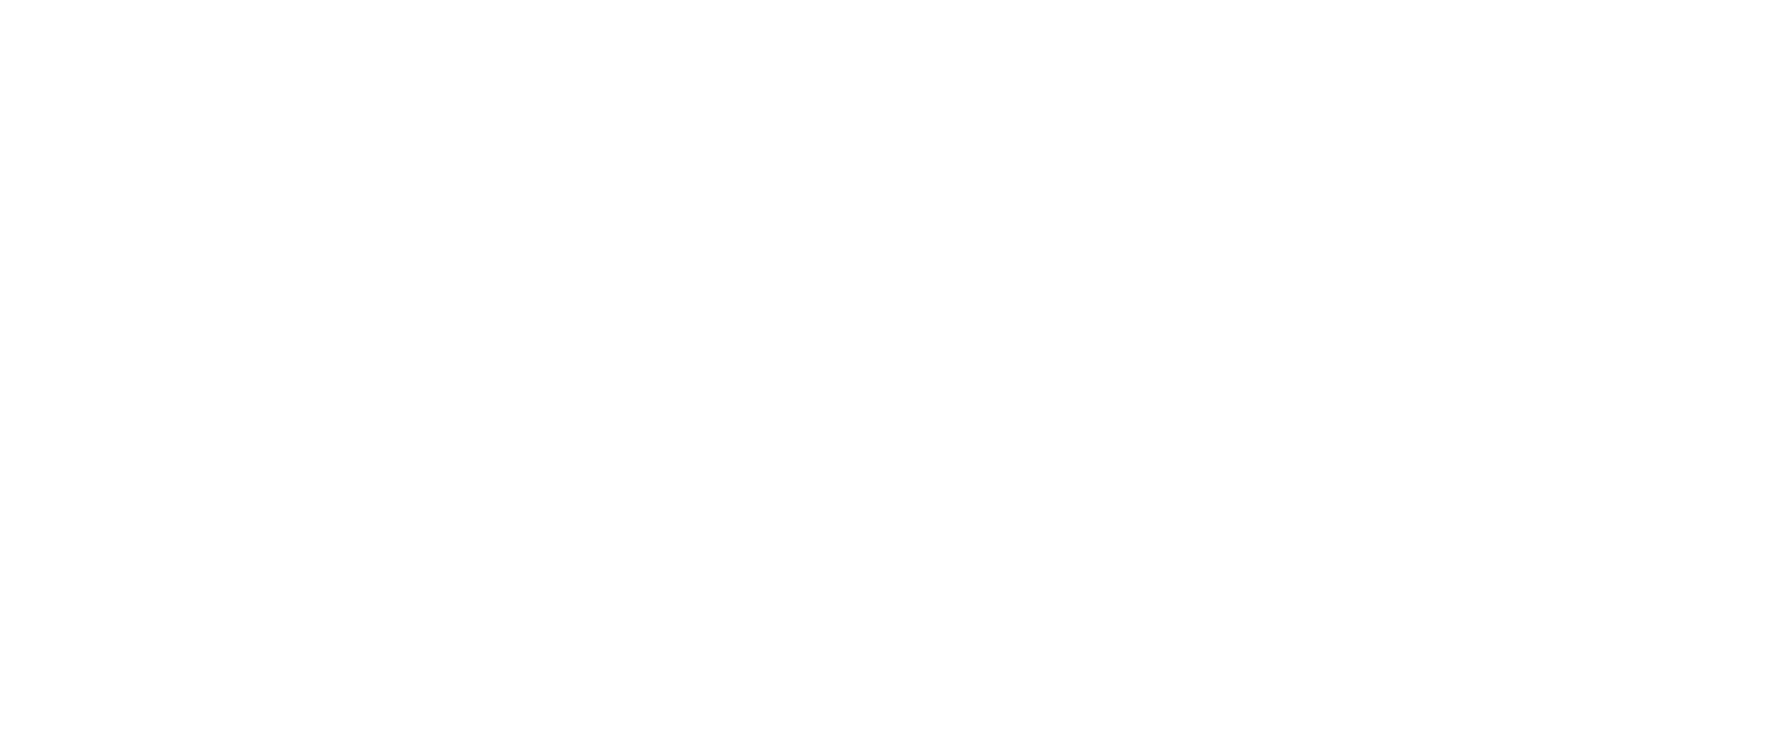 Credentially bug report 🐞 / improvement idea 💡